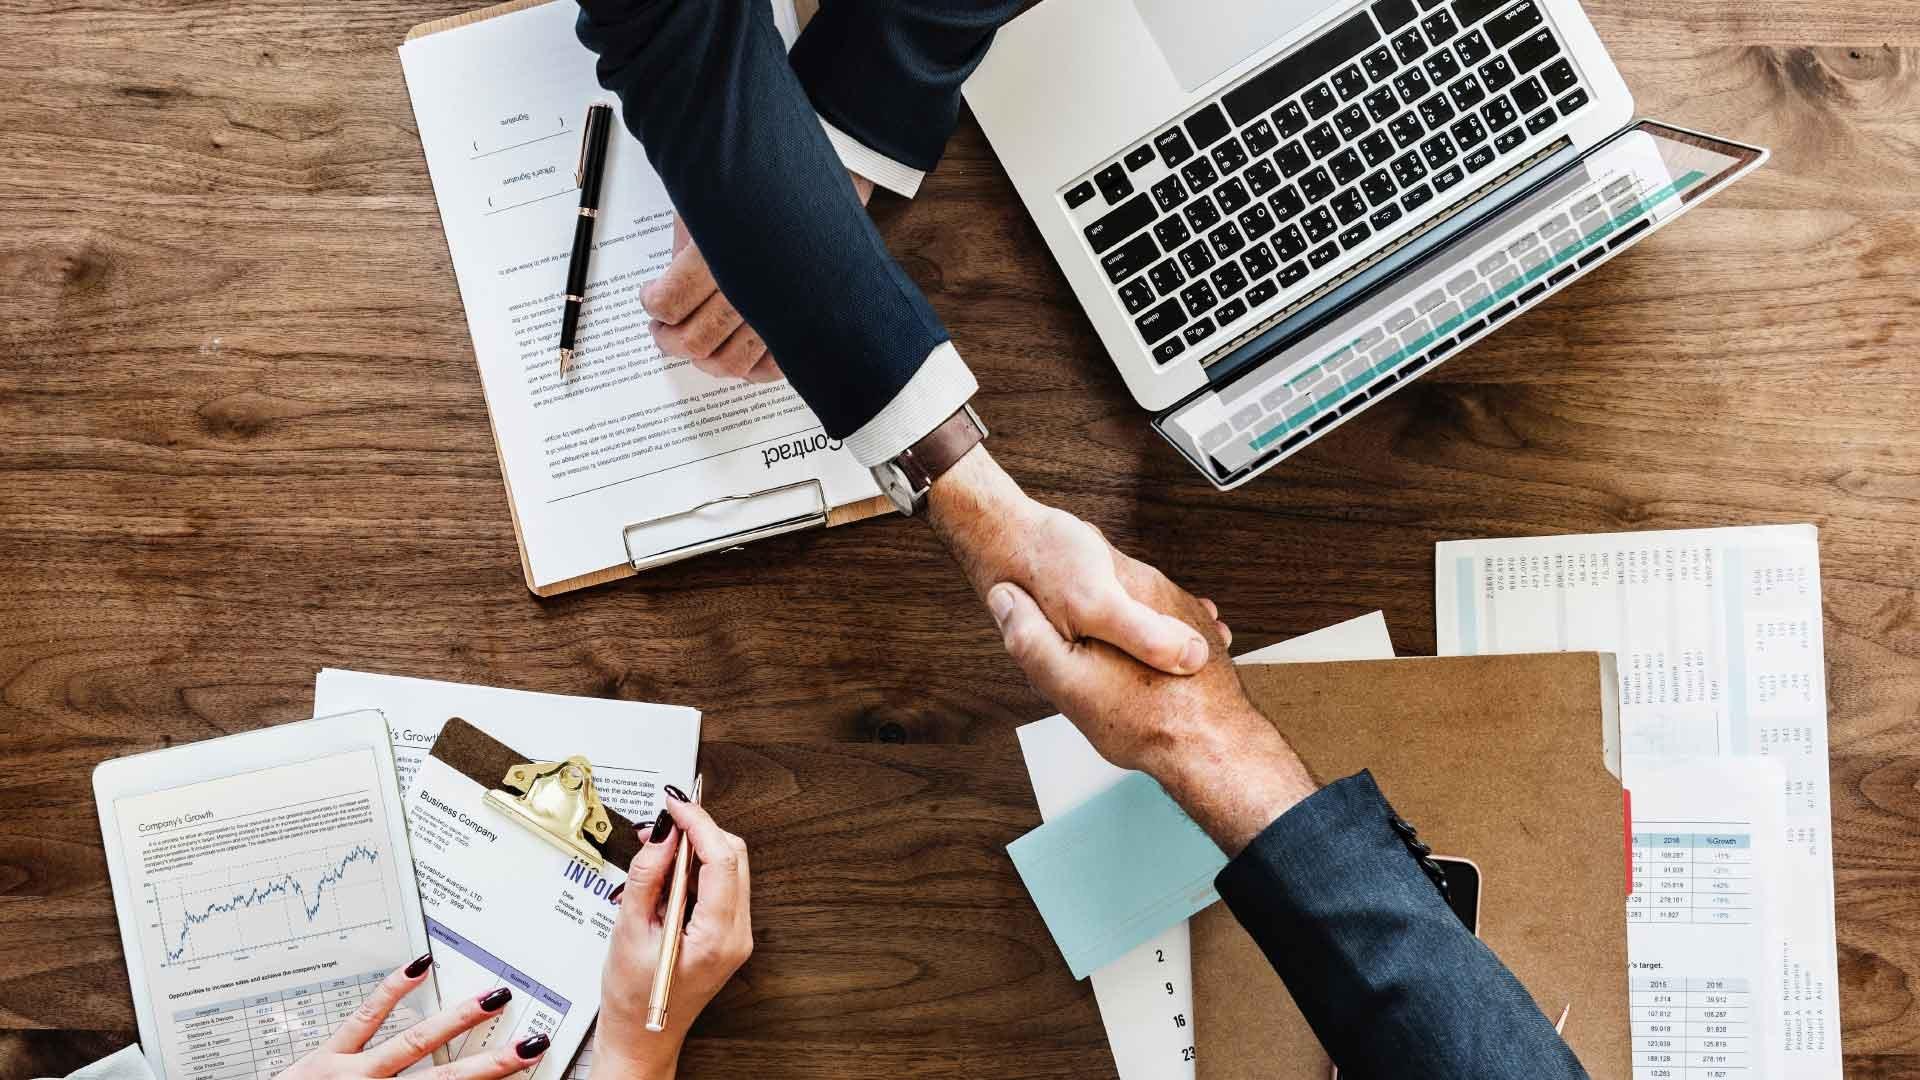 business-contract-agreement-hand-shake.jpg